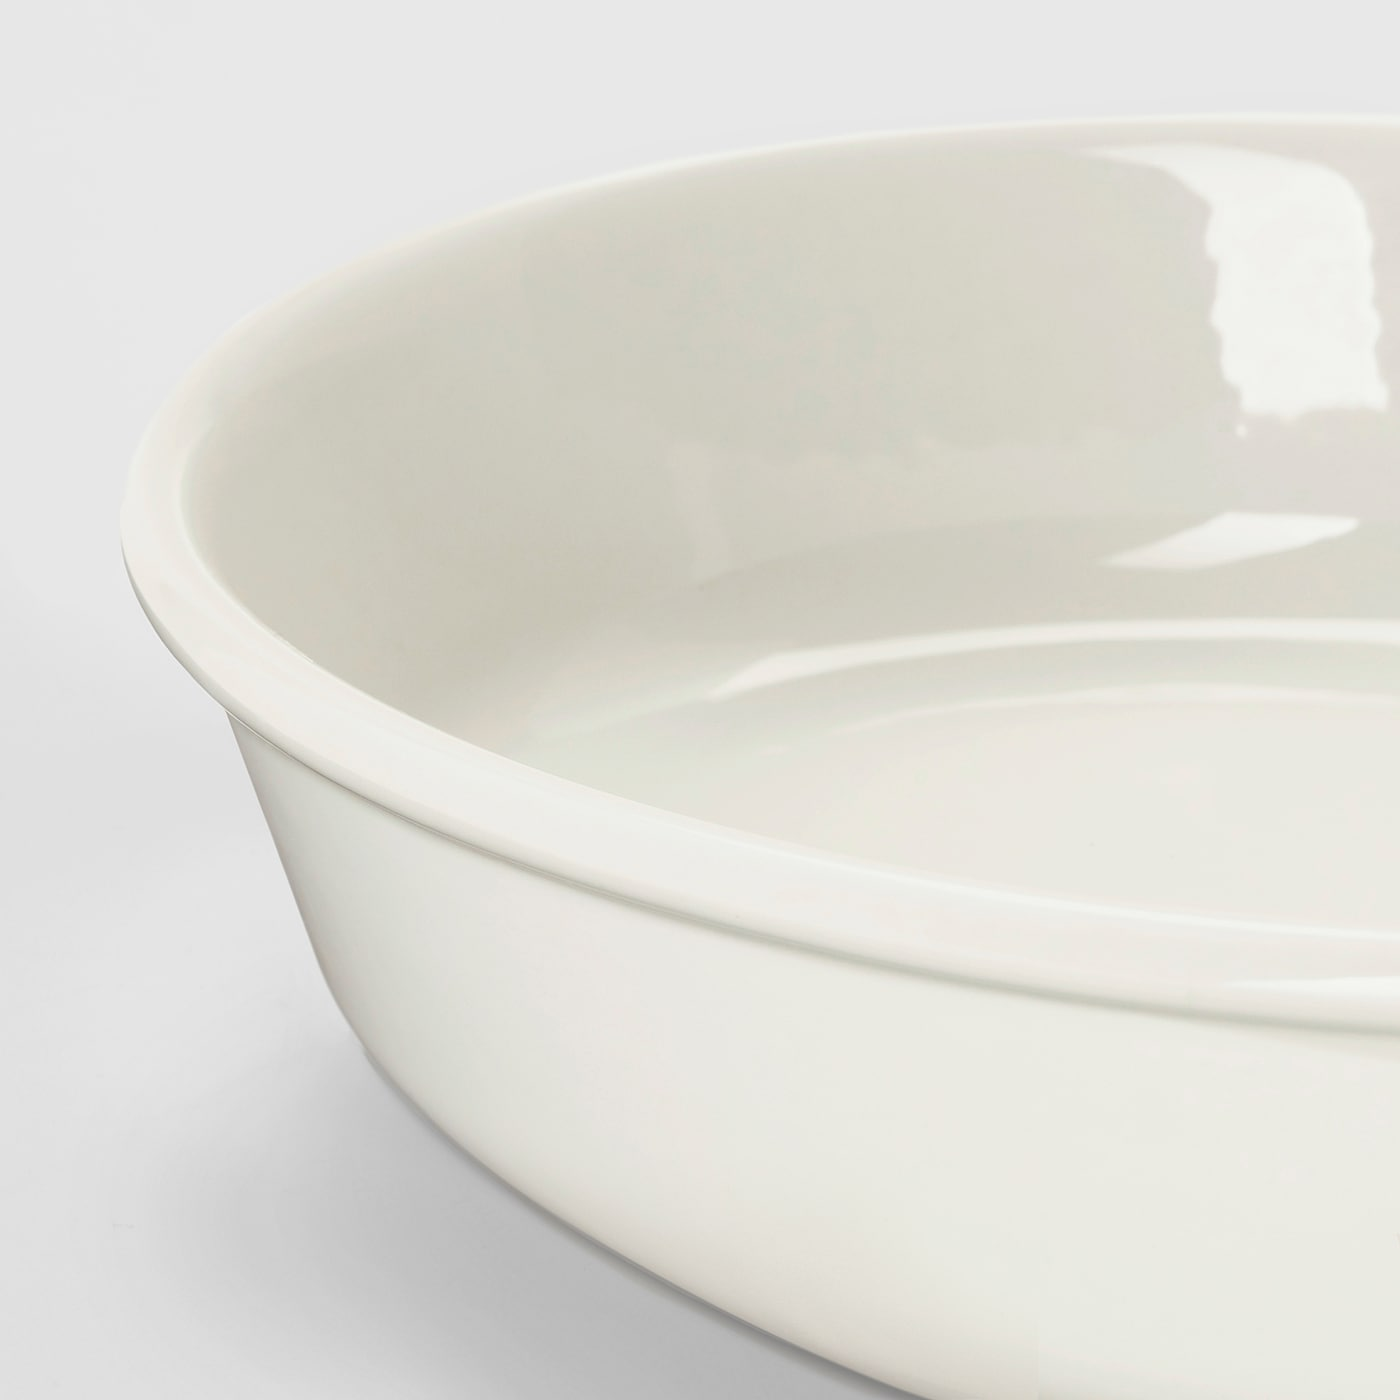 VARDAGEN Ofenform, oval/elfenbeinweiß, 26x21 cm